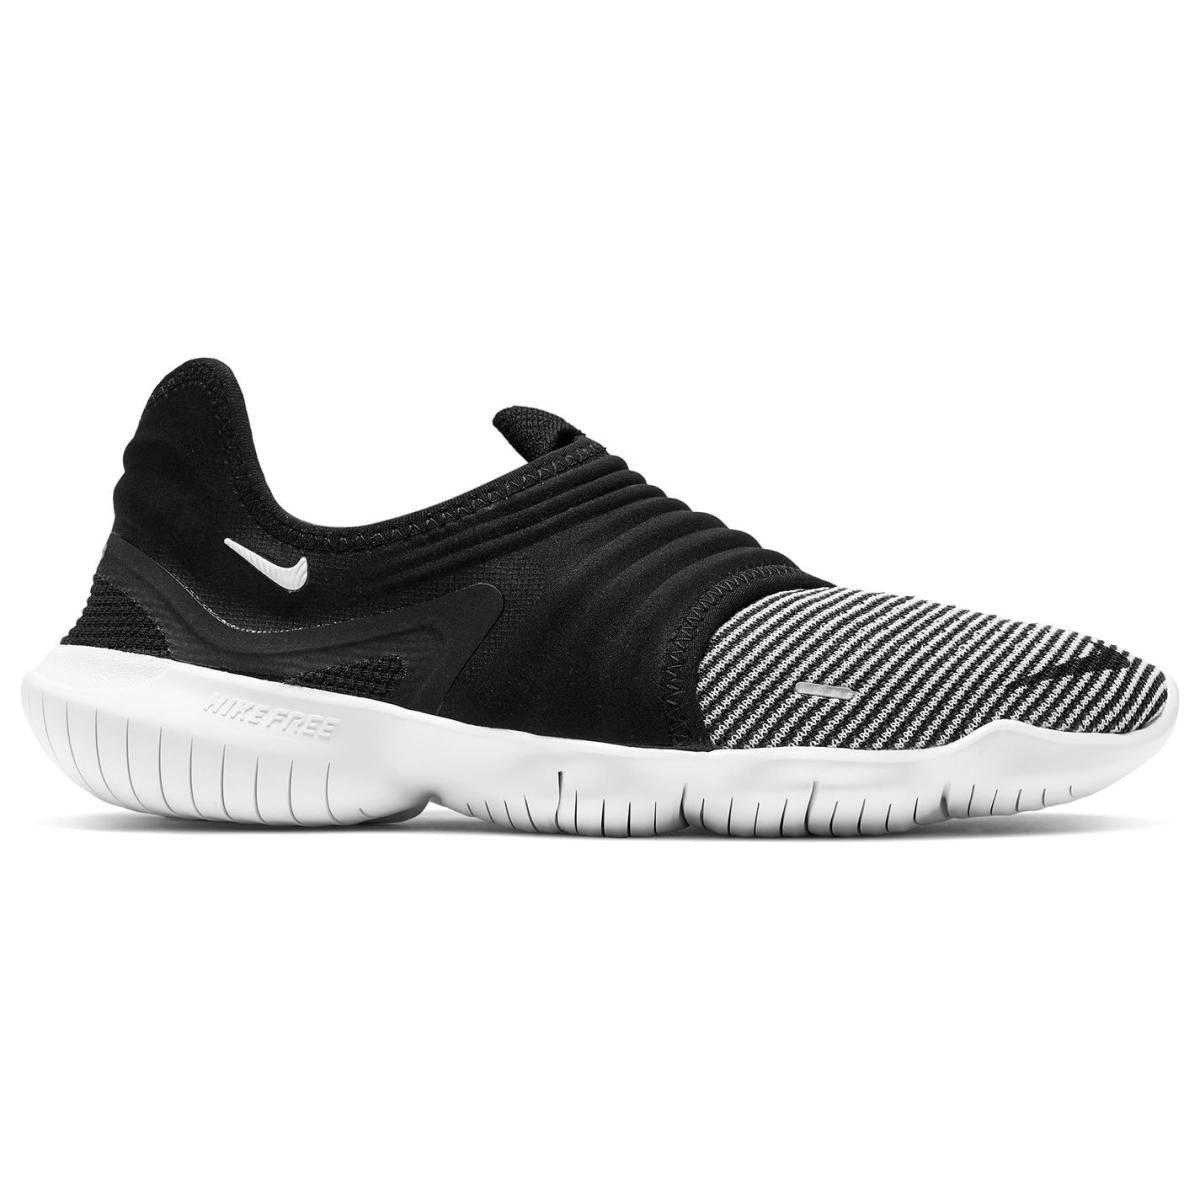 Nike-Free-Run-Flyknit-3-0-Turnschuhe-Damen-Sneaker-Sportschuhe-Laufschuhe-4450 Indexbild 3